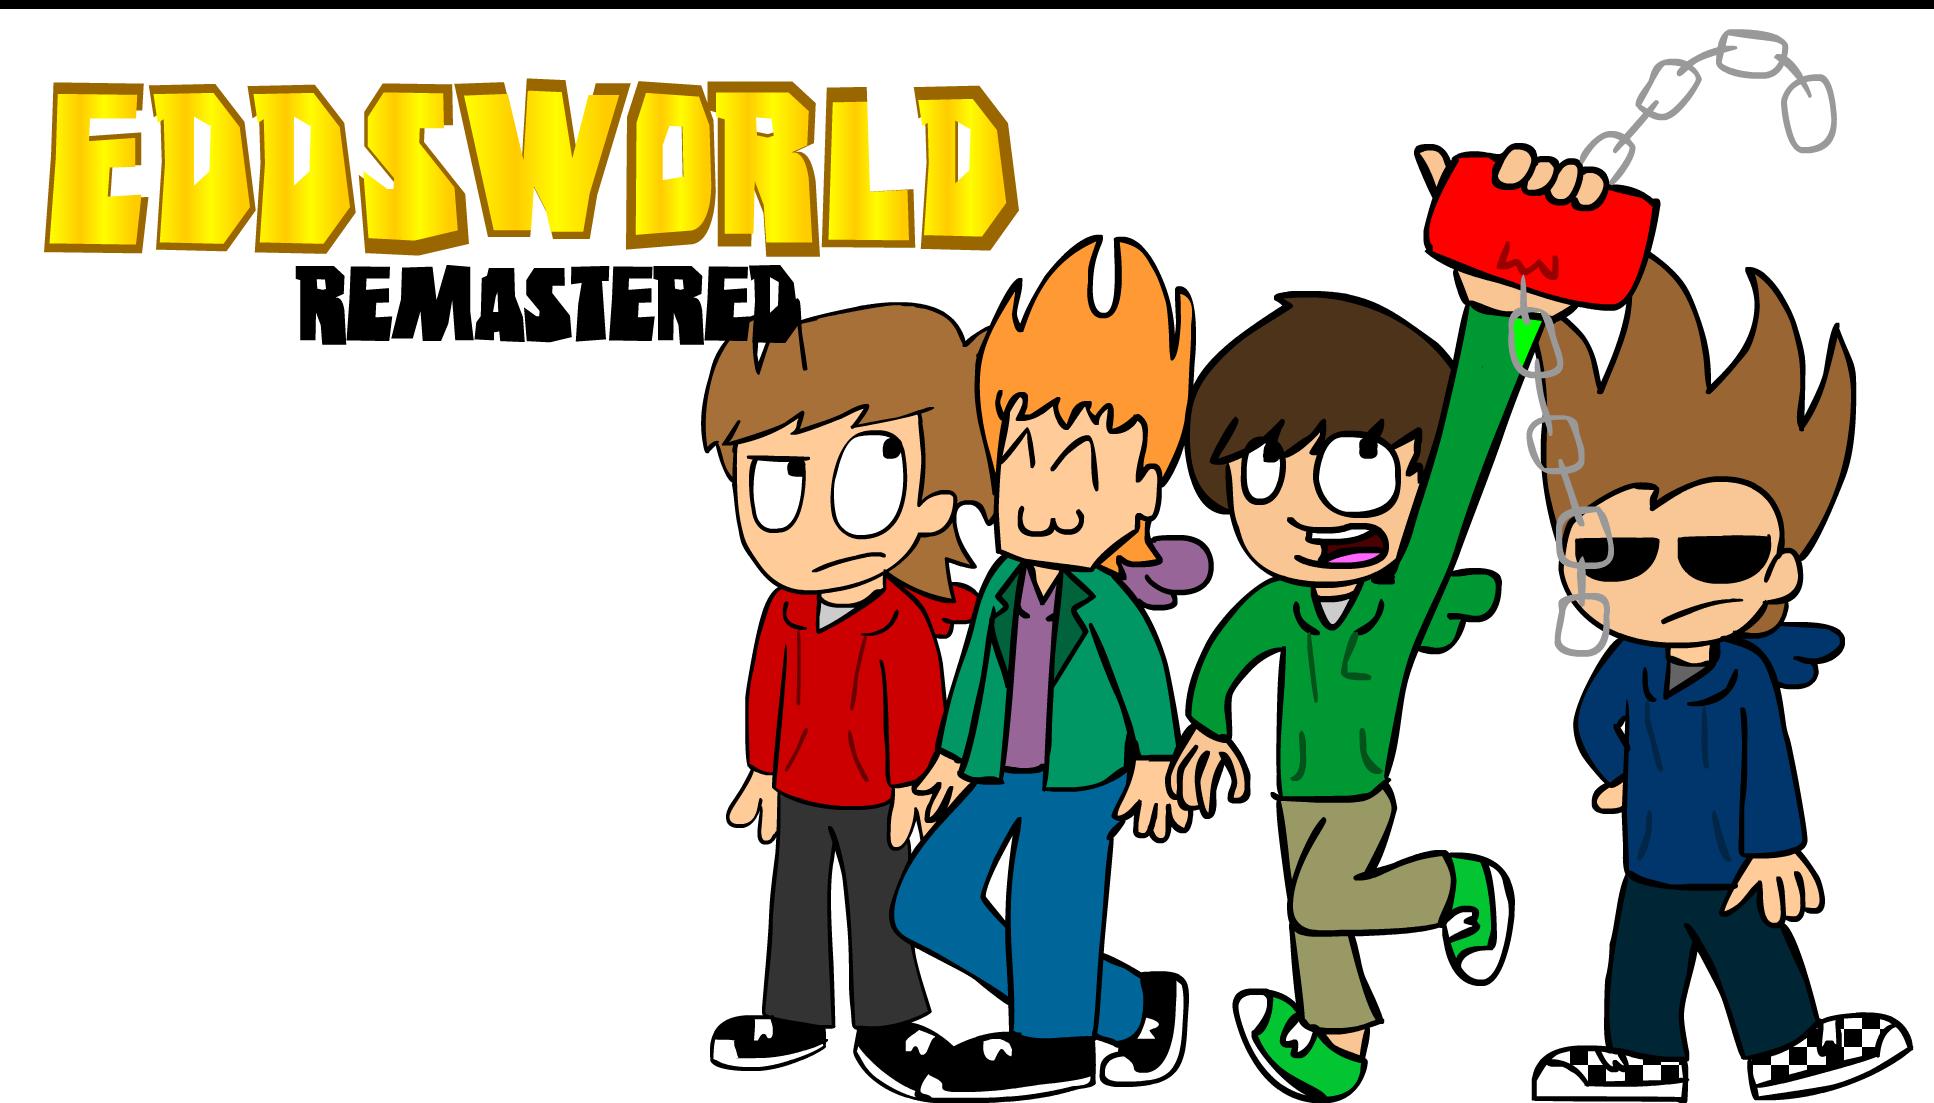 Eddsworld Remastered Designs